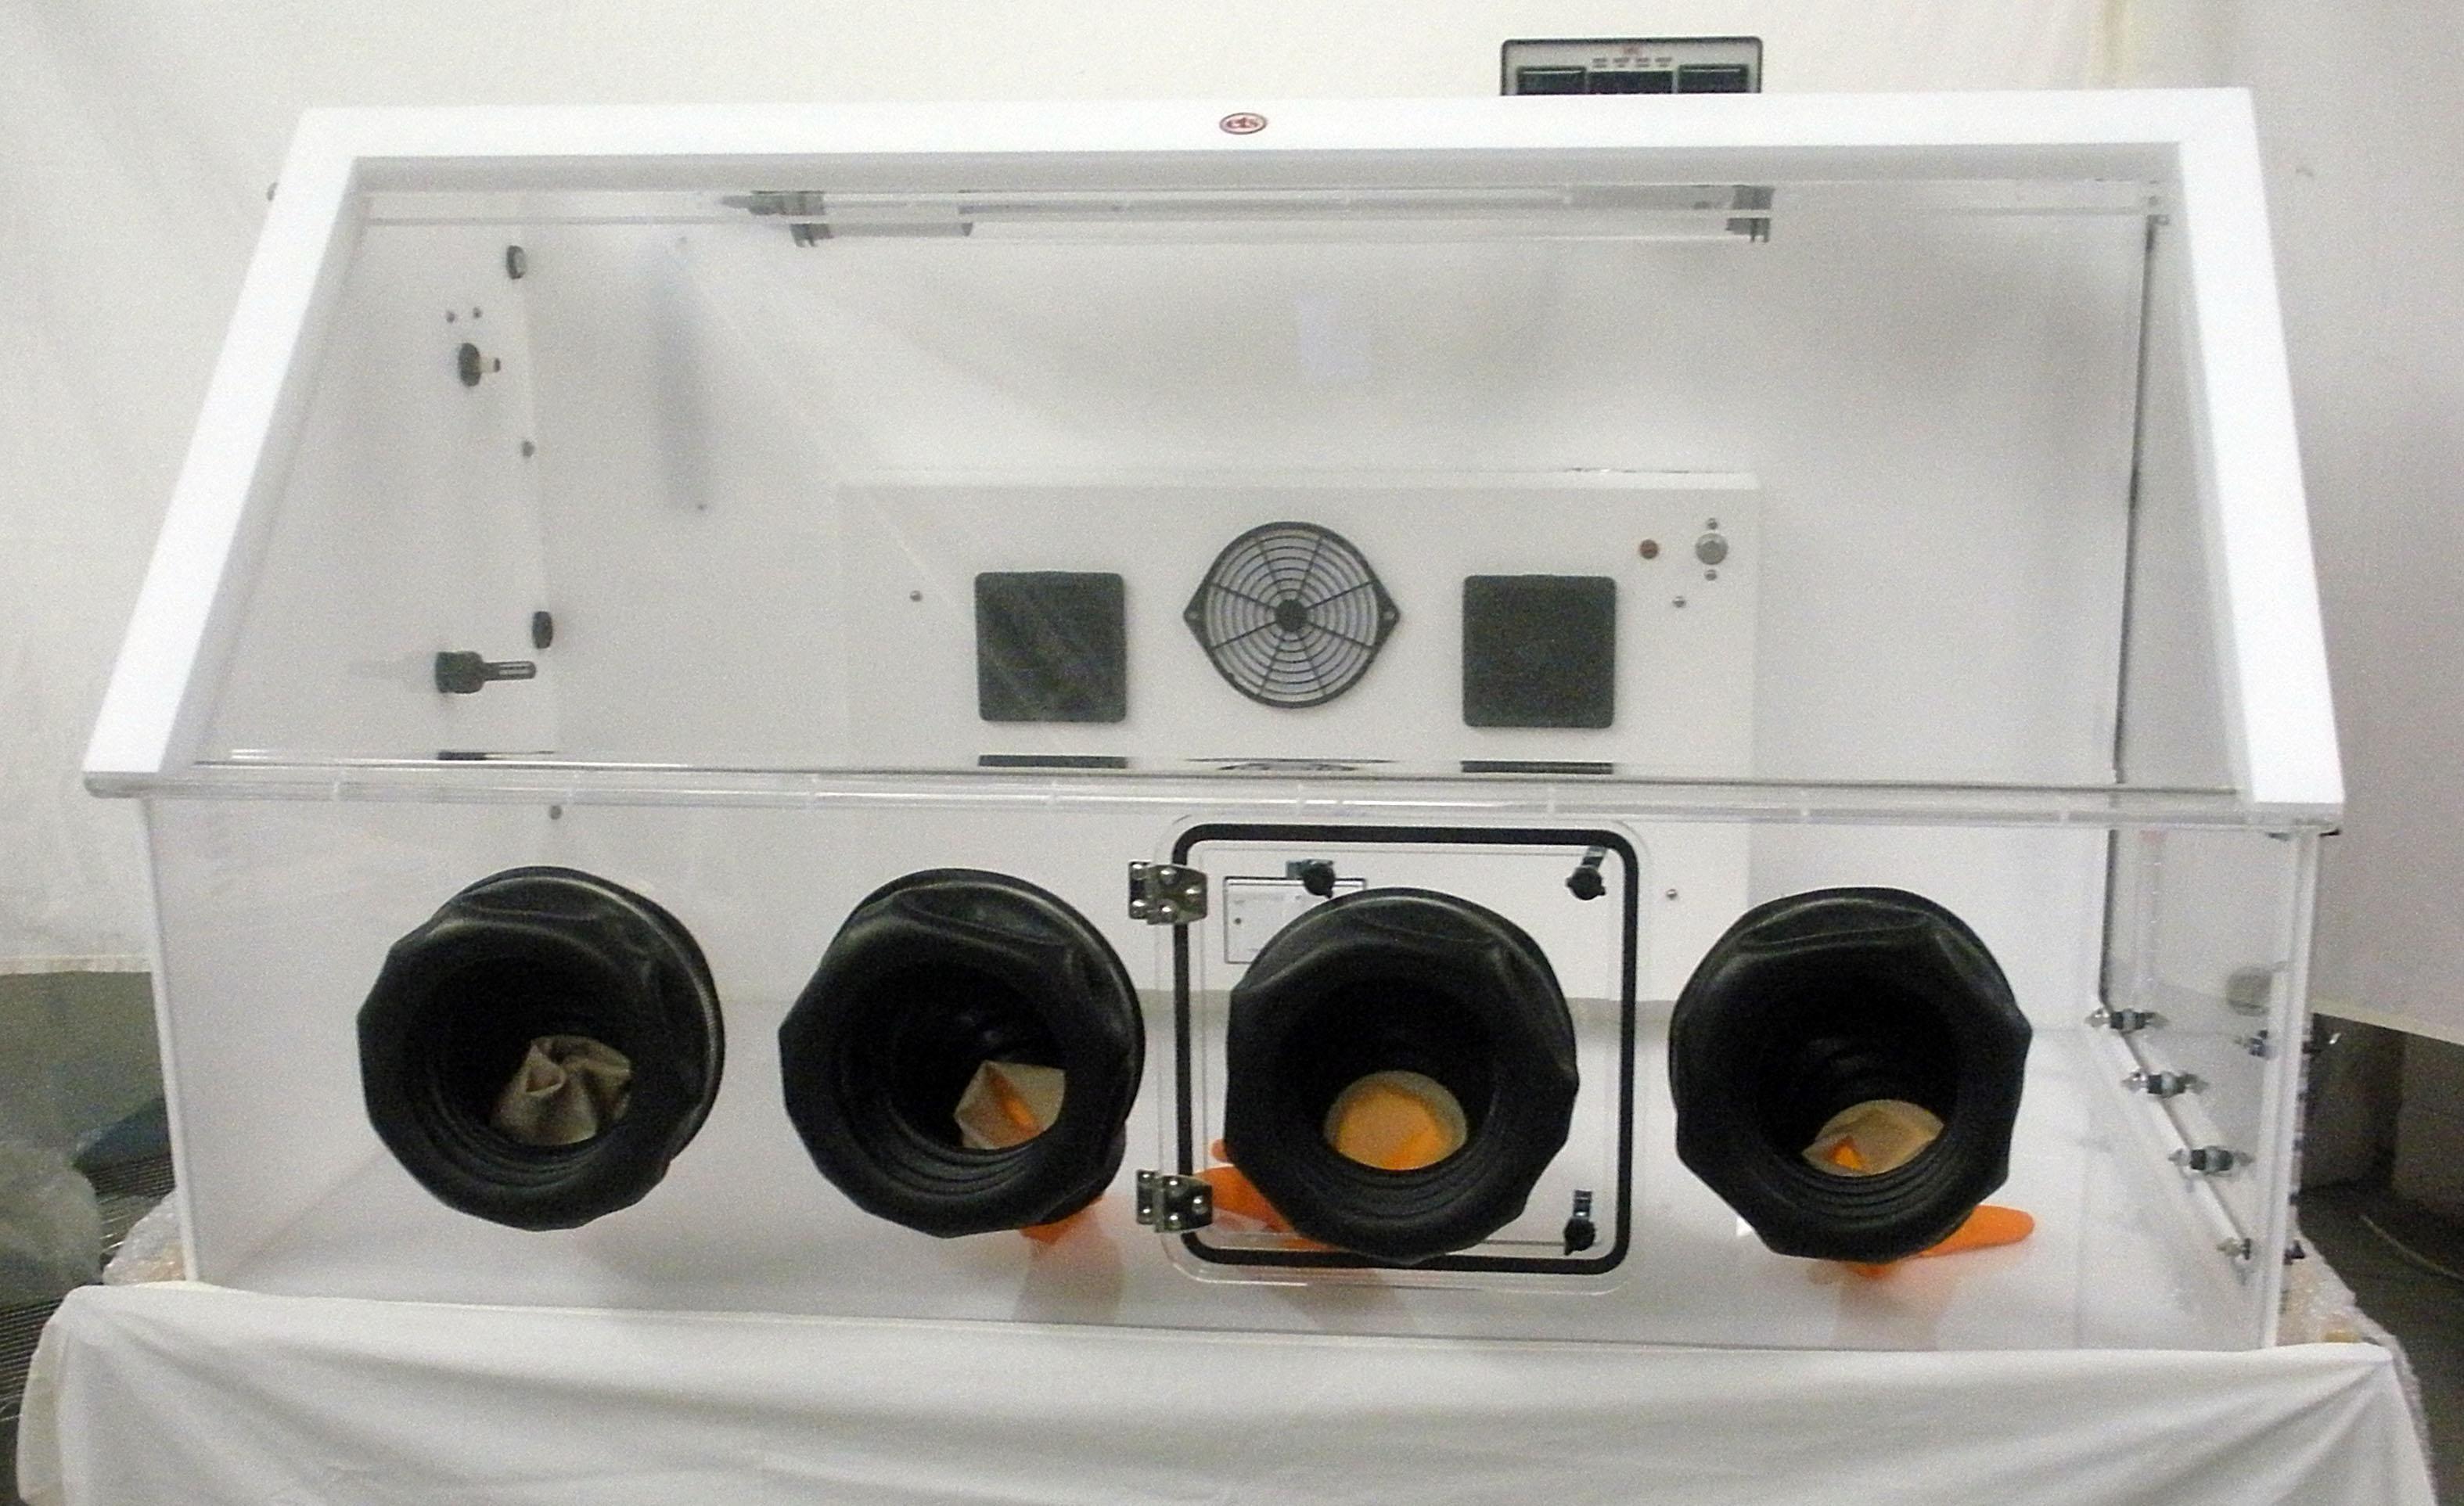 Model 5515 – The SUBZERO Glove Box Environmental Chamber